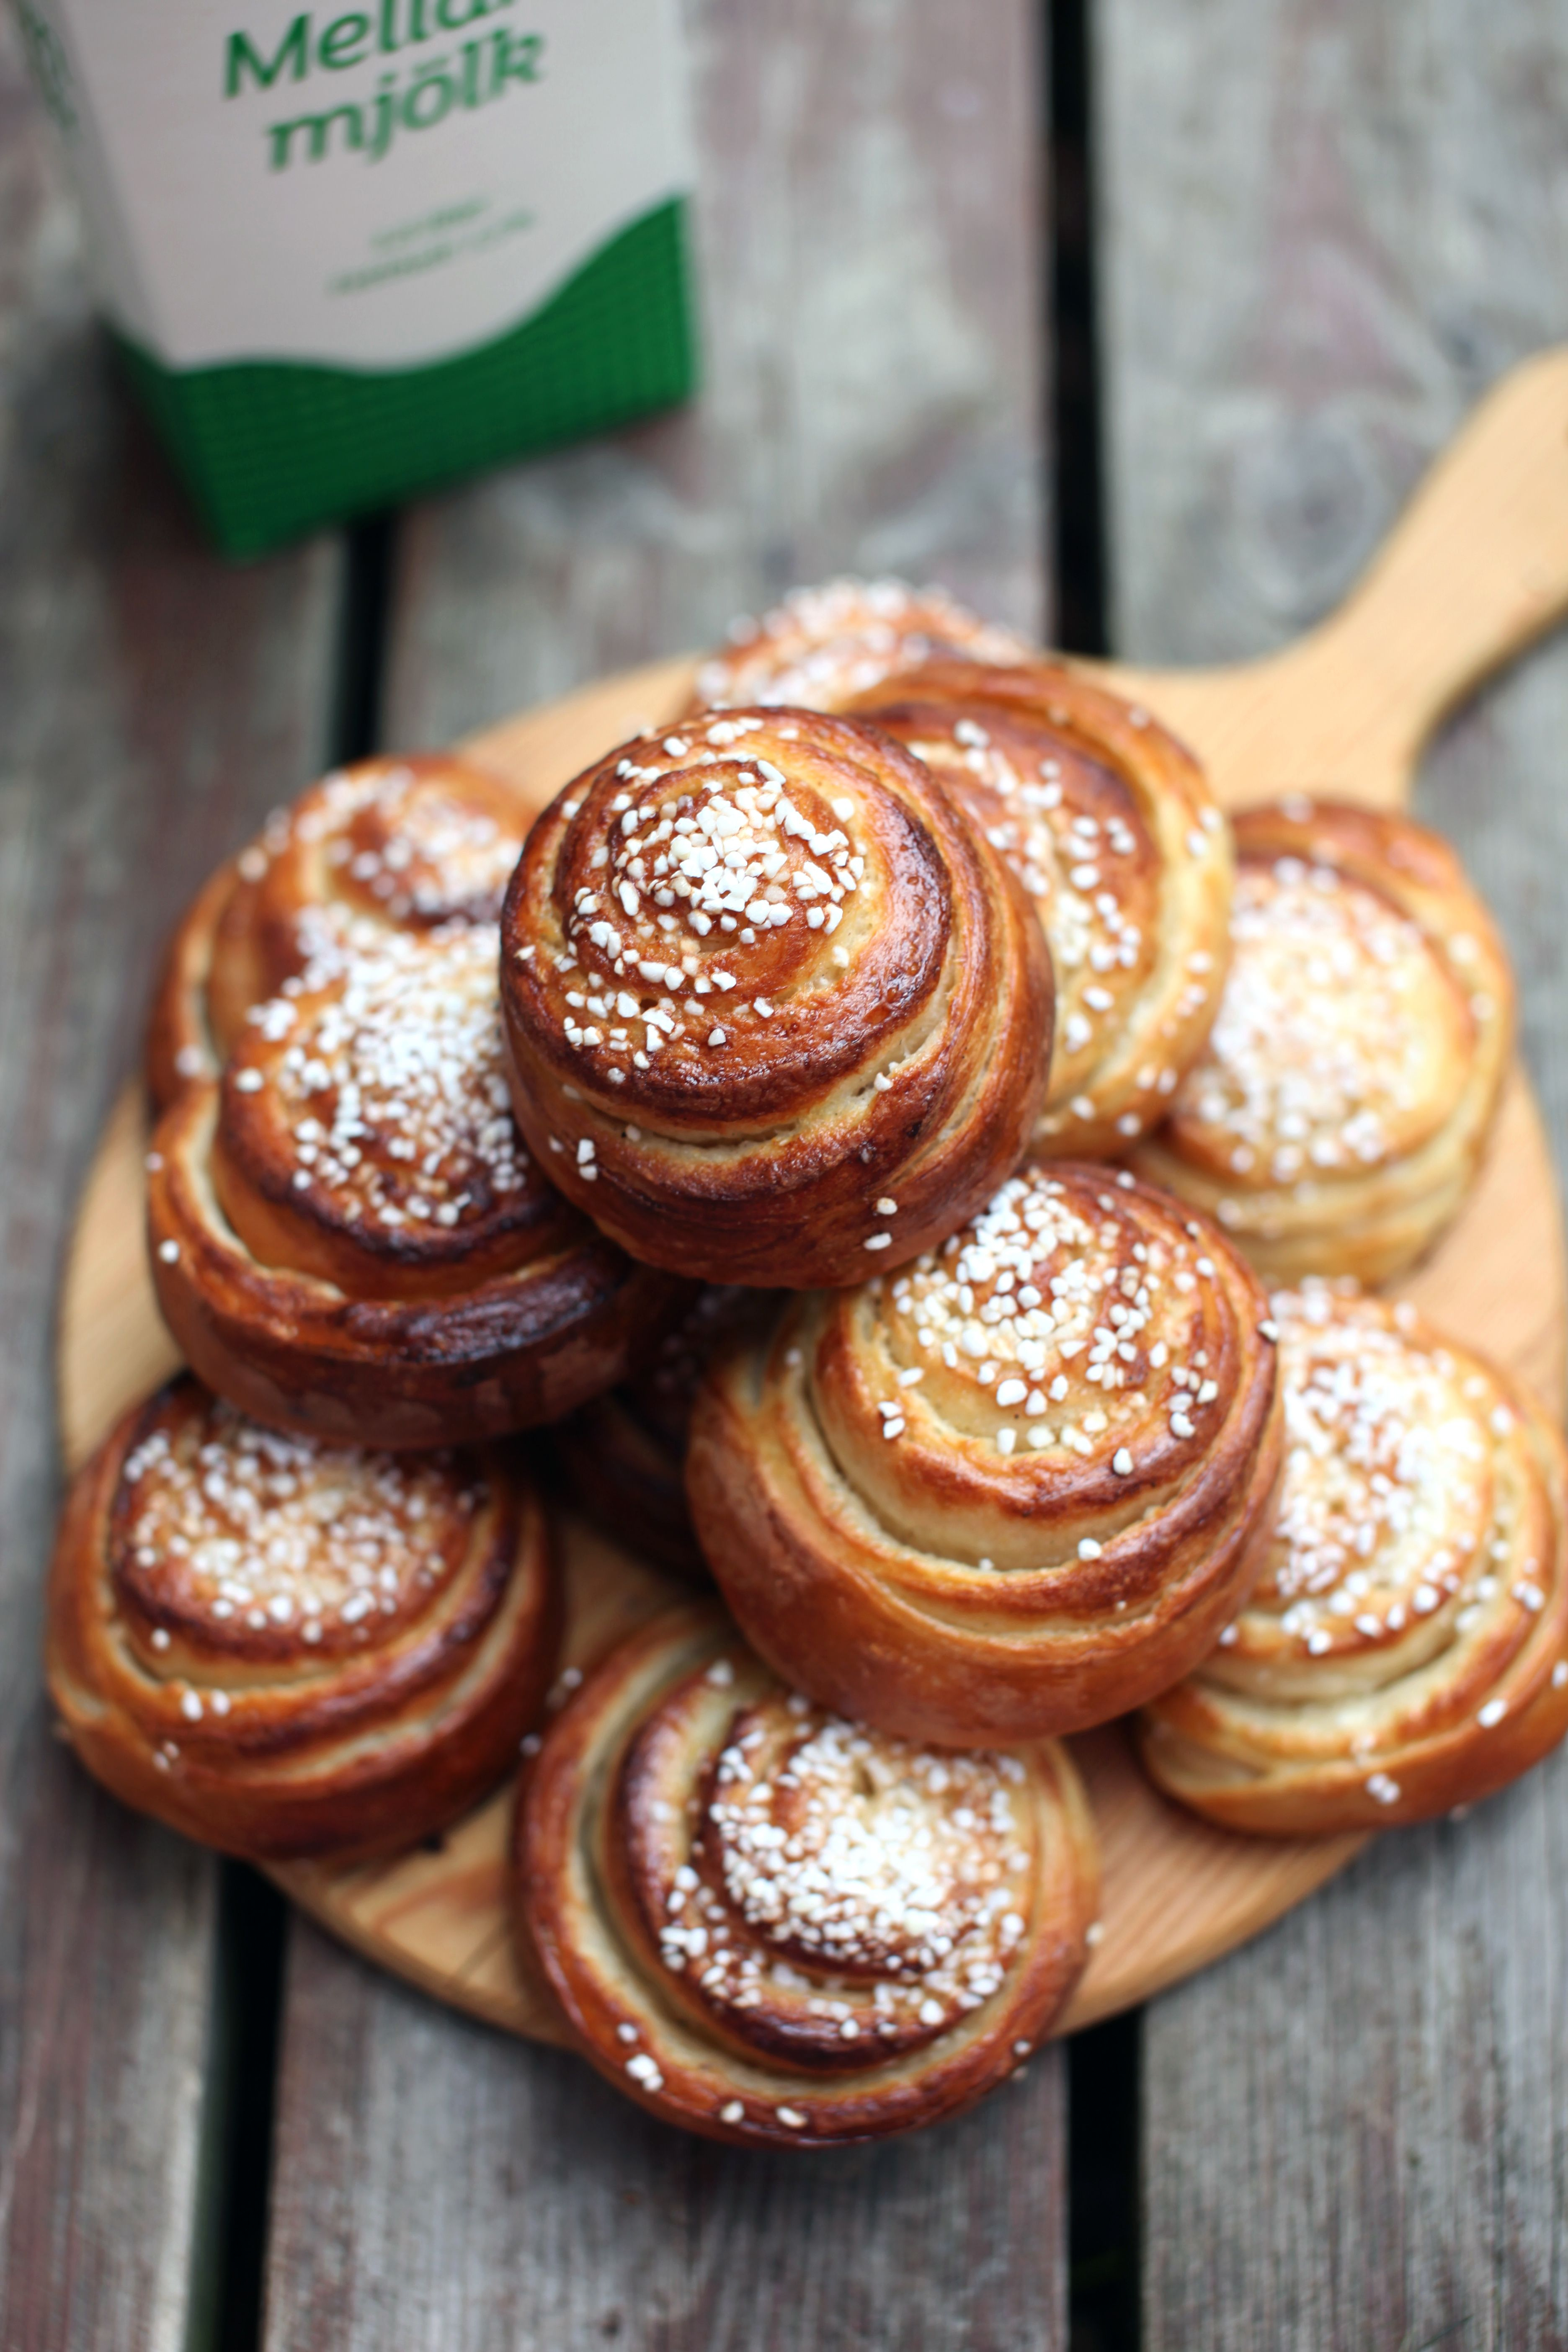 vanilla and cardamom sugar buns - a classic Swedish dessert